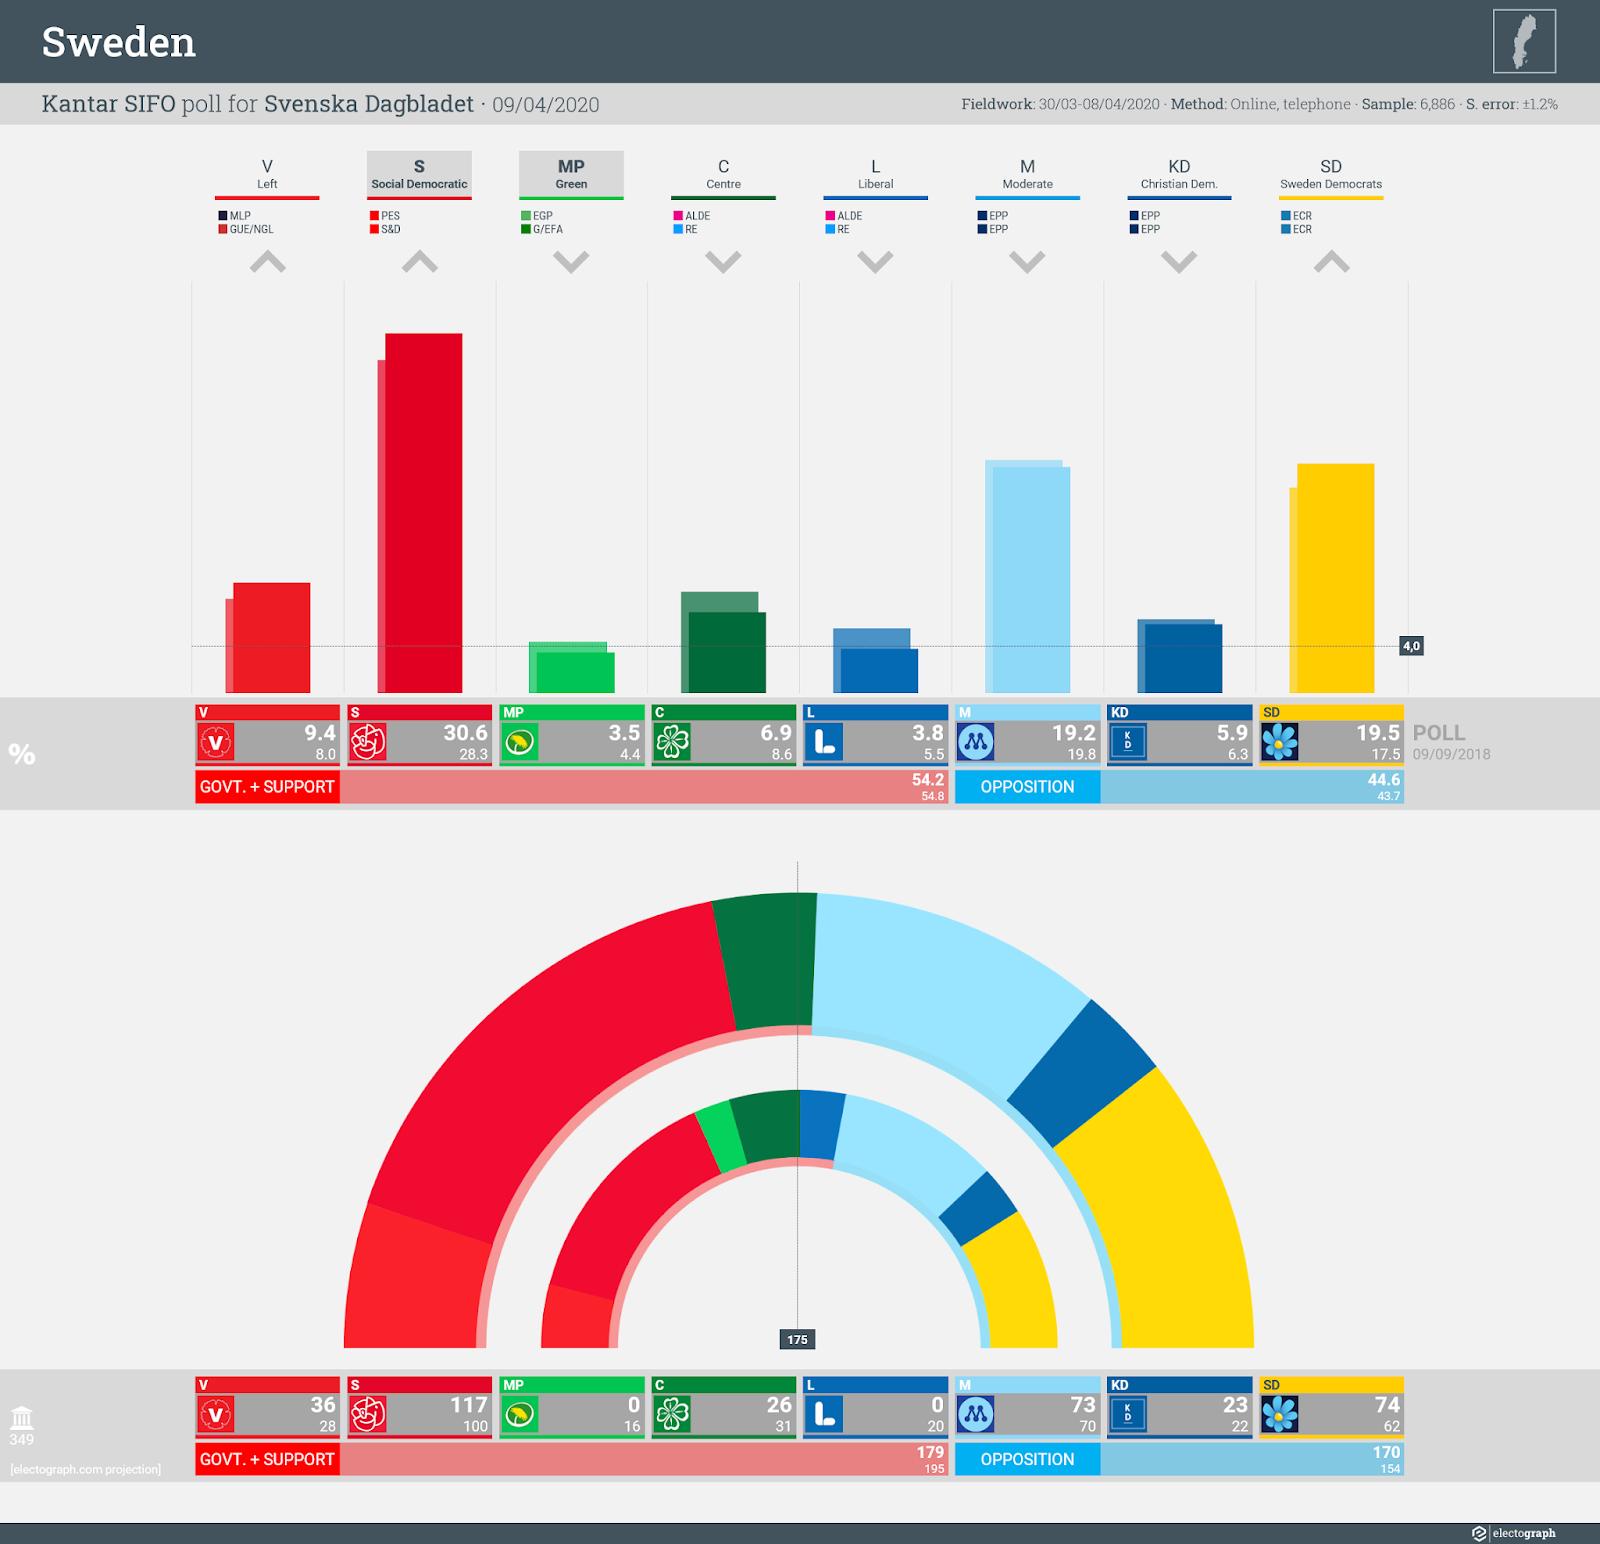 SWEDEN: Kantar SIFO poll chart for Svenska Dagbladet, 9 April 2020